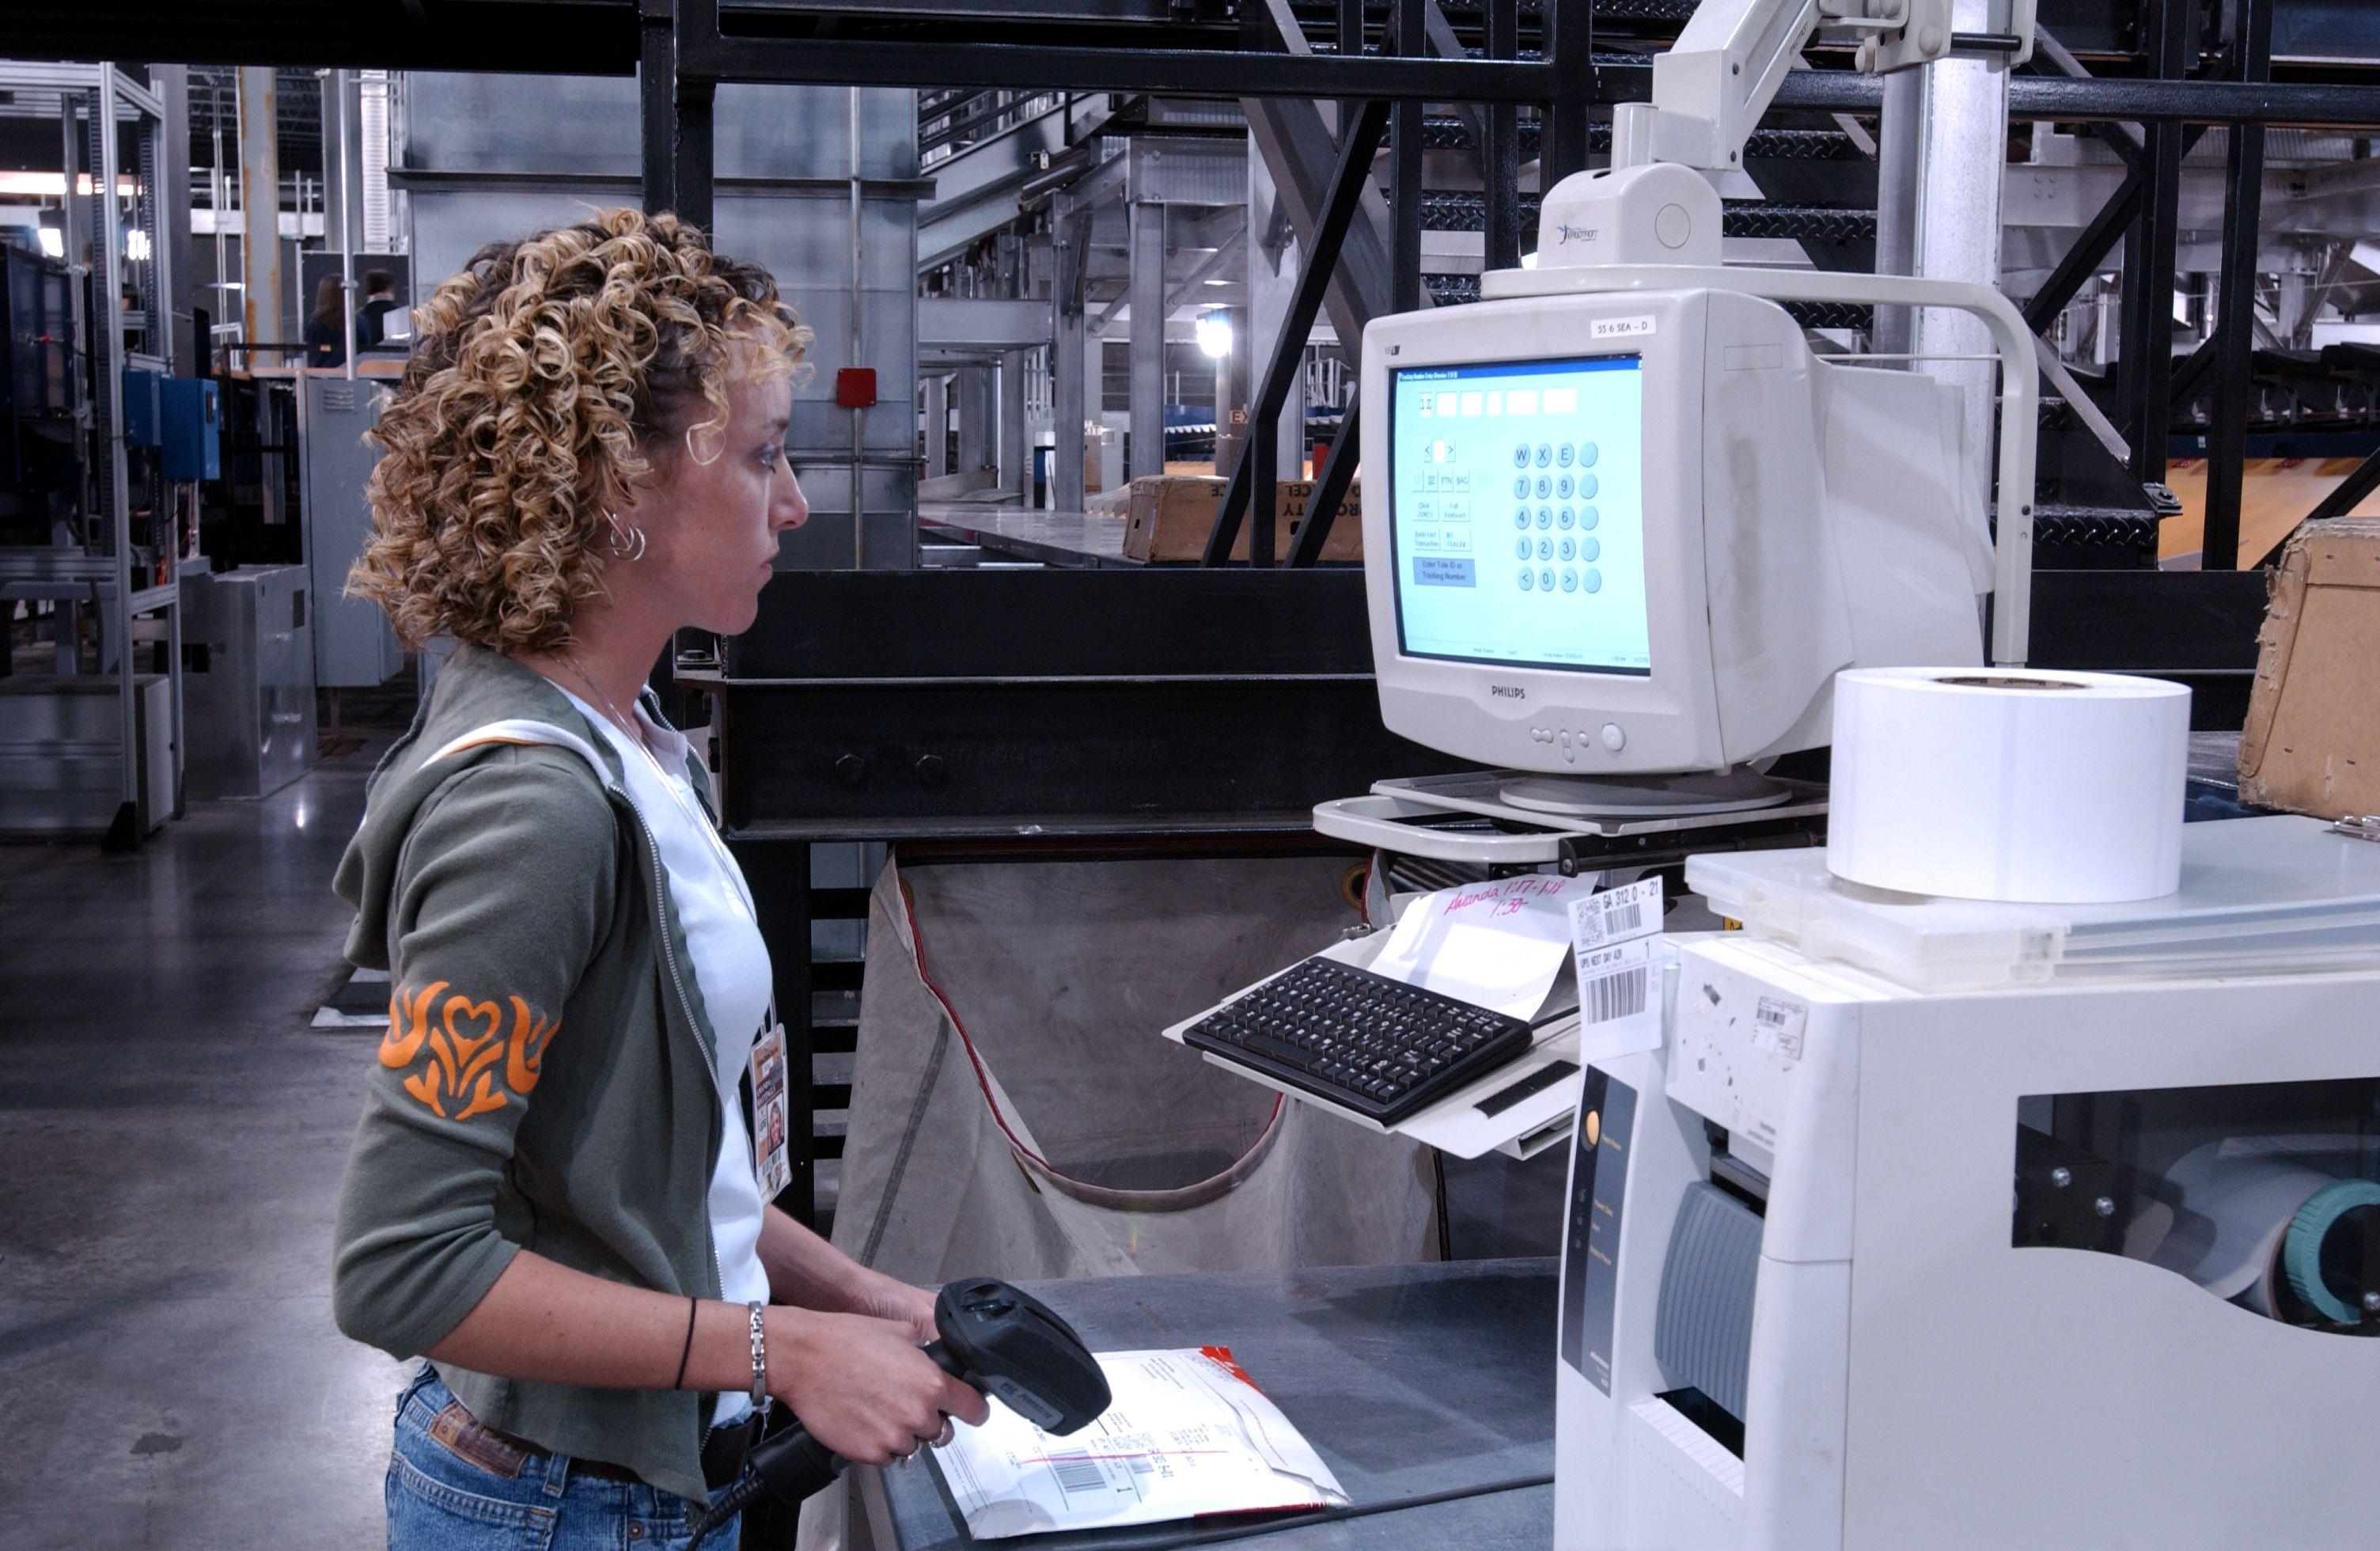 Employee working at UPS Worldport computer station